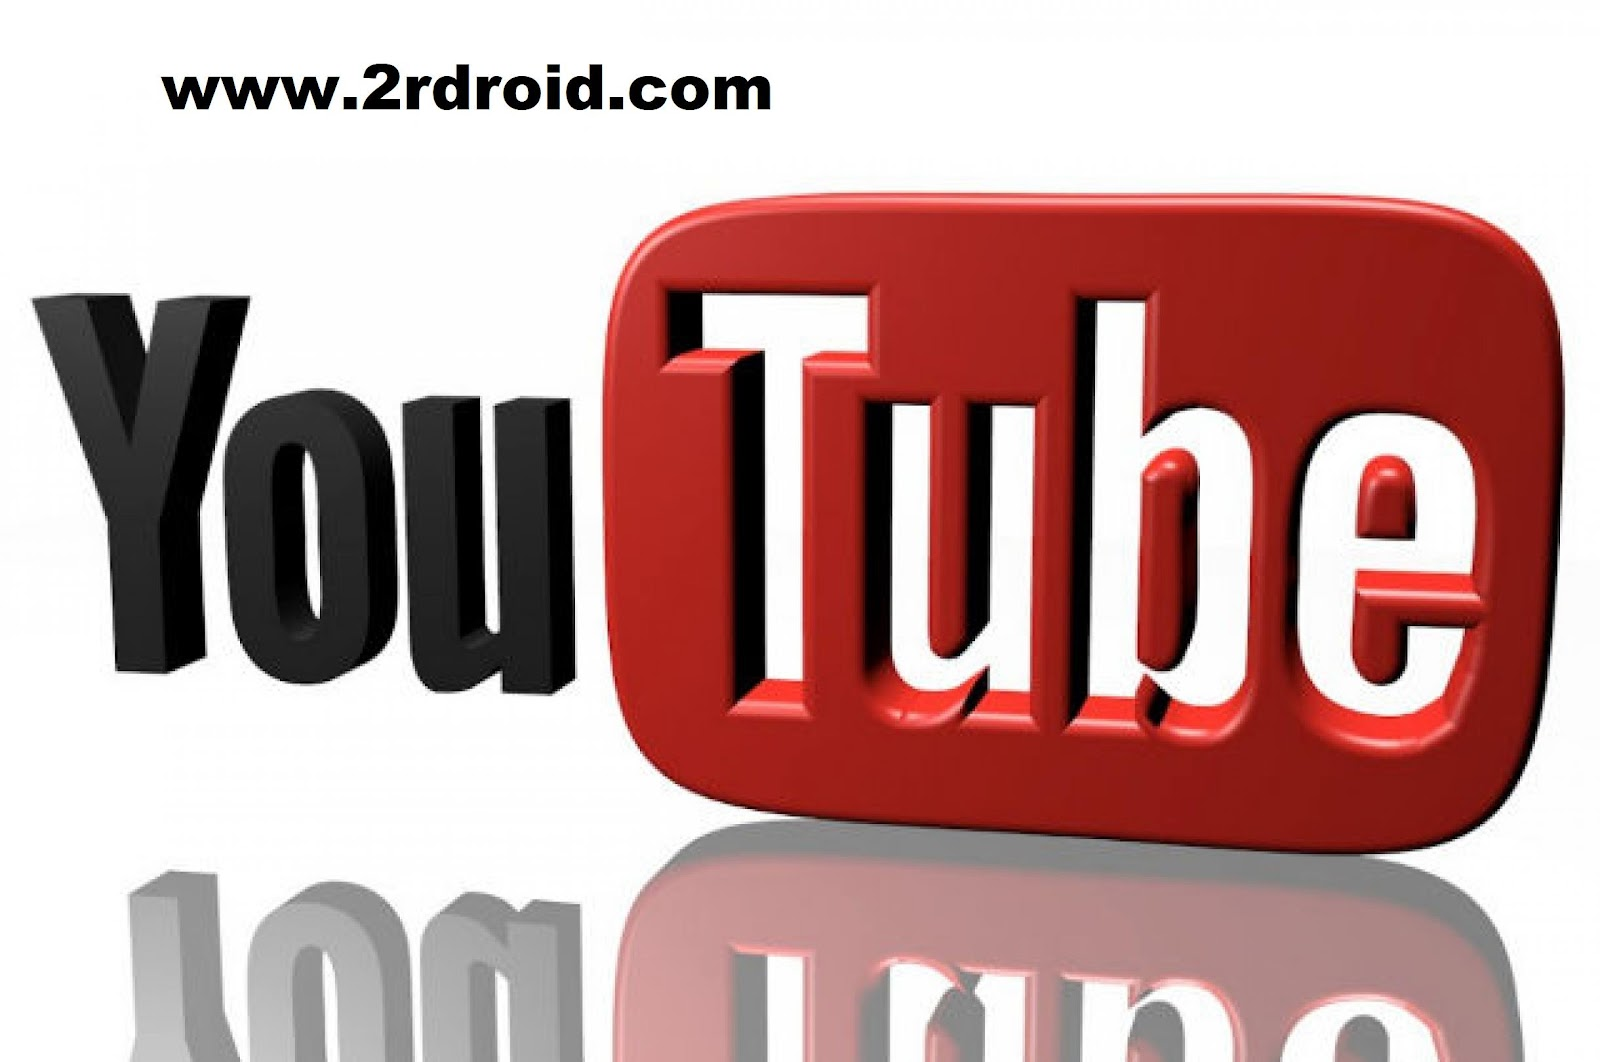 يوتيوب تغير تطبيقاها لأول مره بالكامل منذ 12 عام